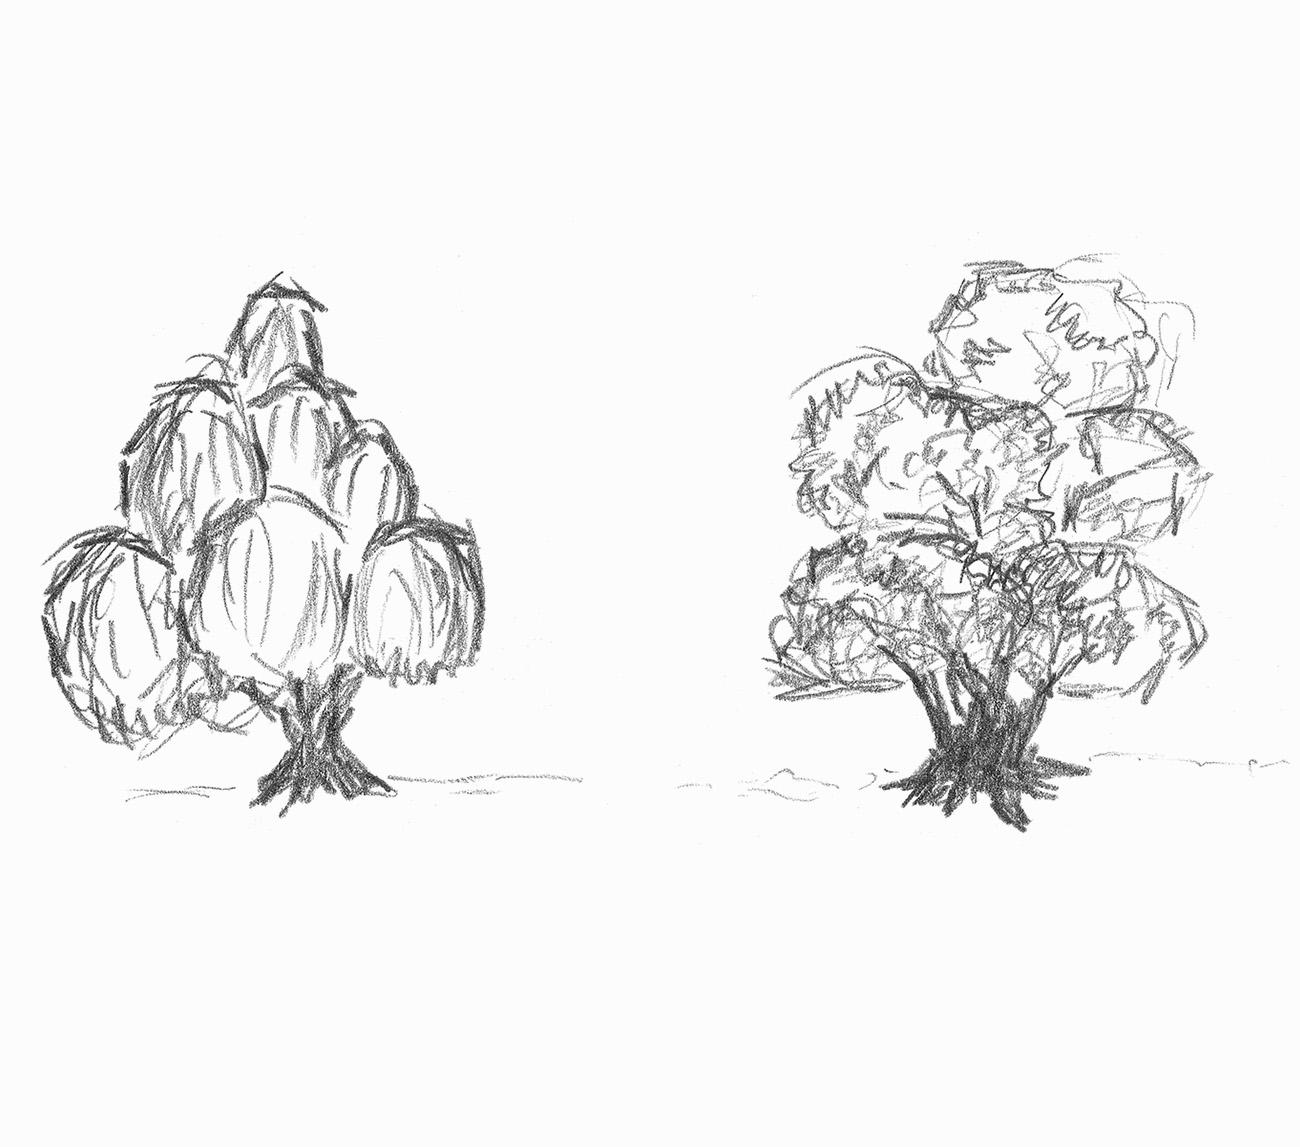 Zwei Baumskizzen